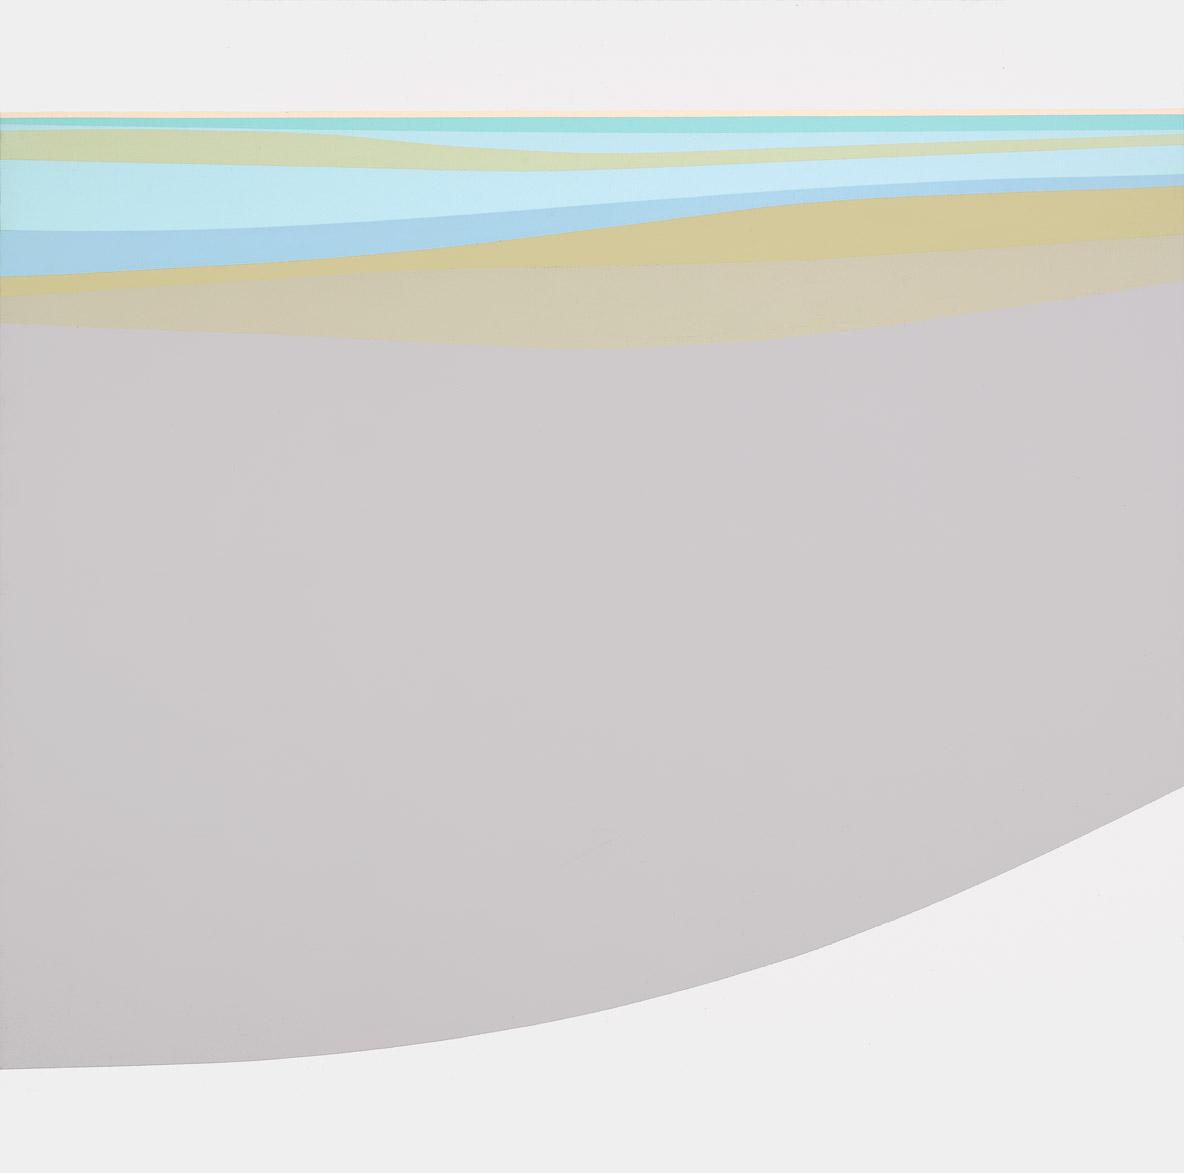 Seashore , 1969  acrylic on canvas 60 x 60 inches; 152.4 x 152.4 centimeters